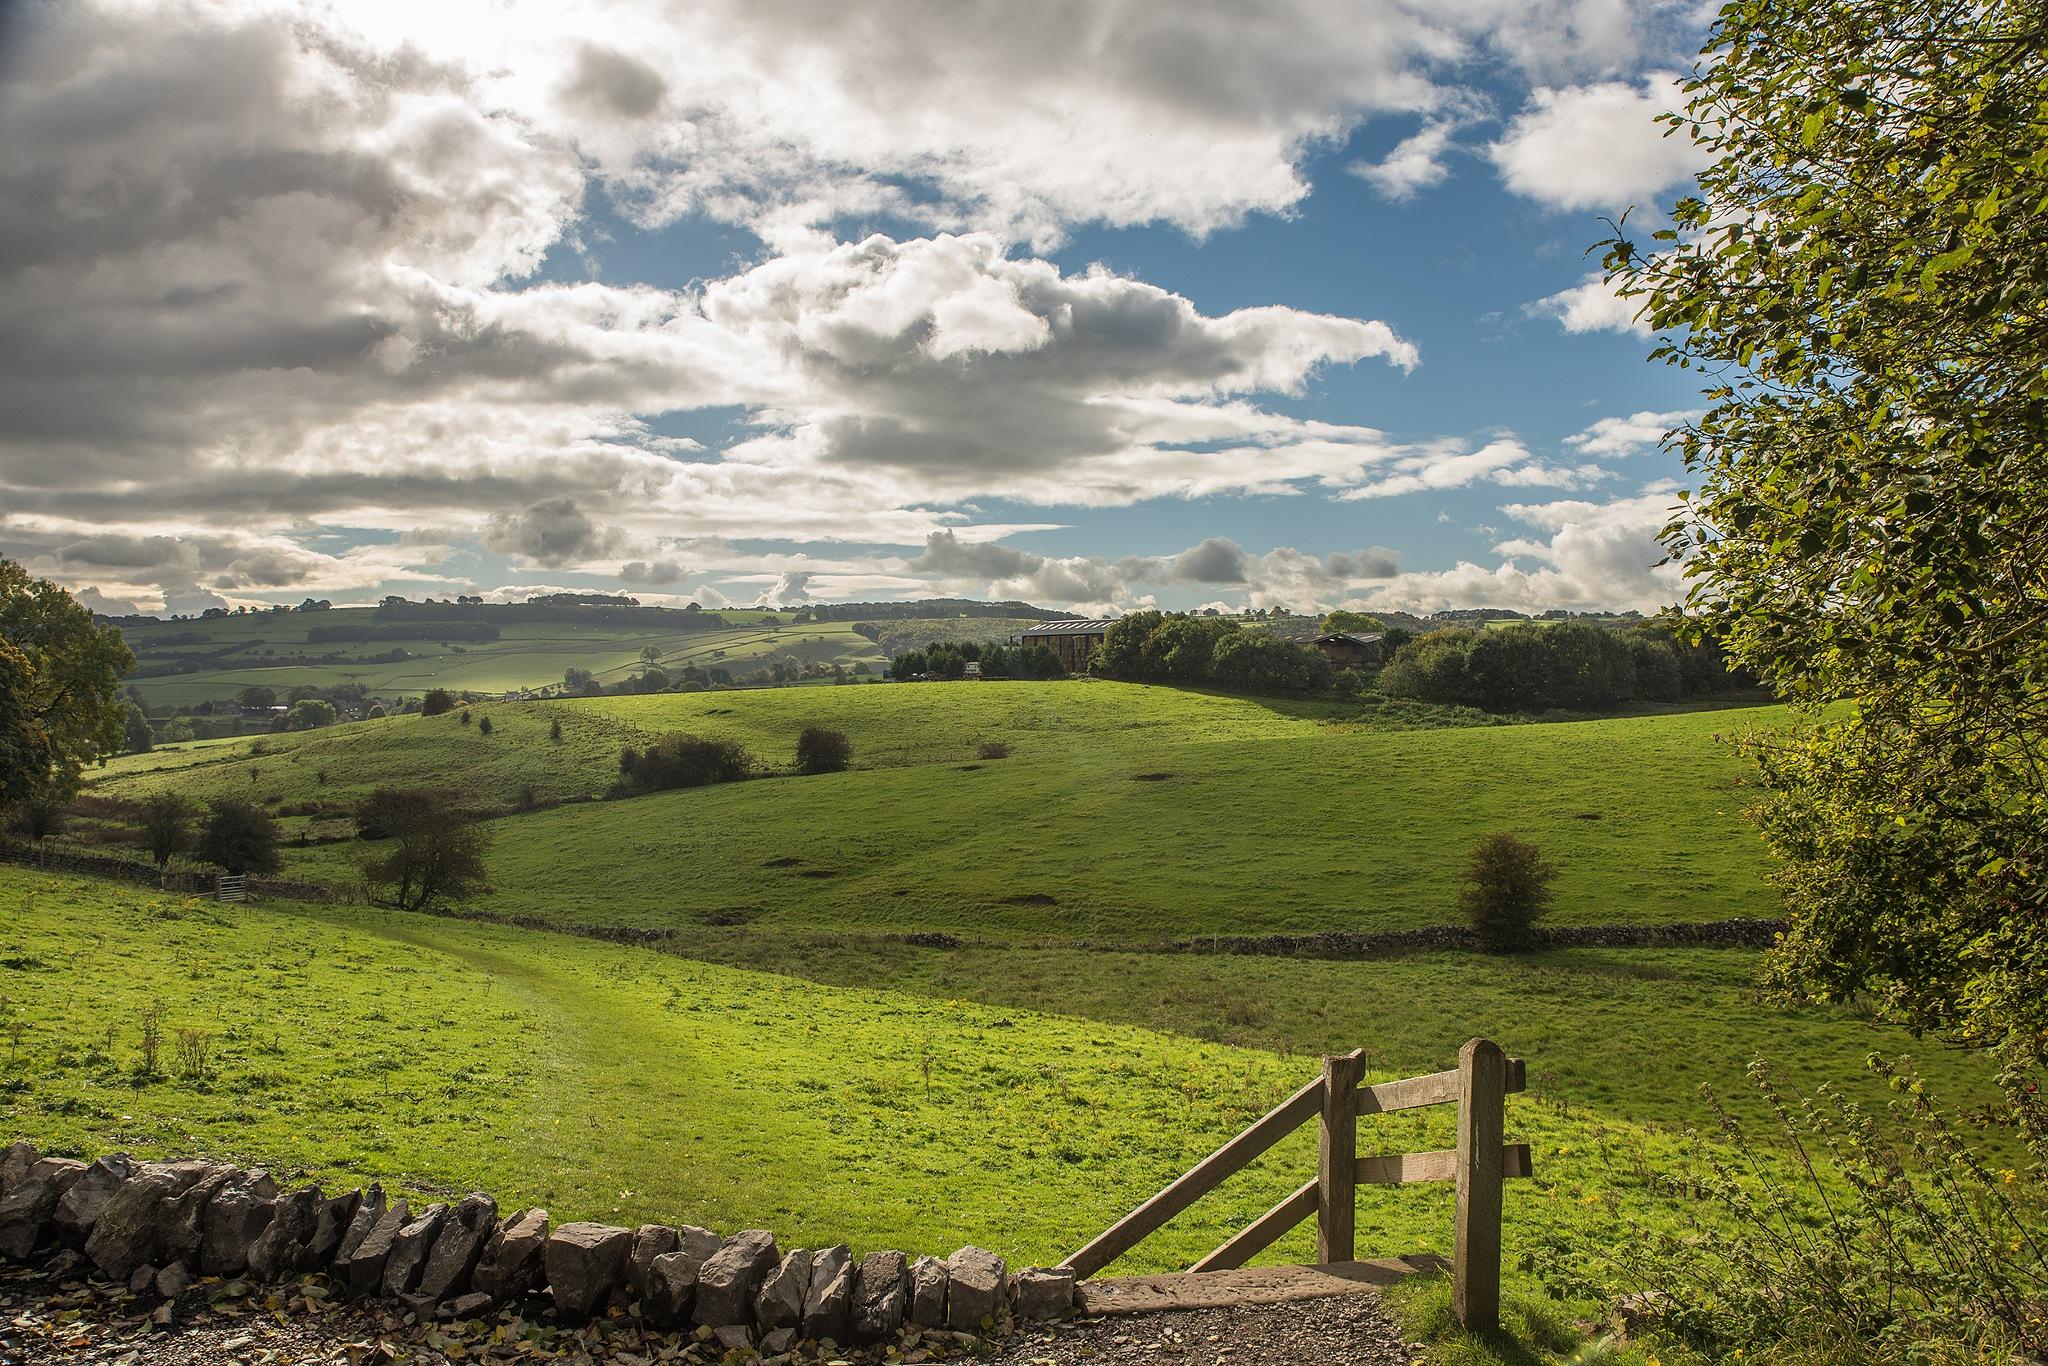 Derbyshire Countryside by jonkennard